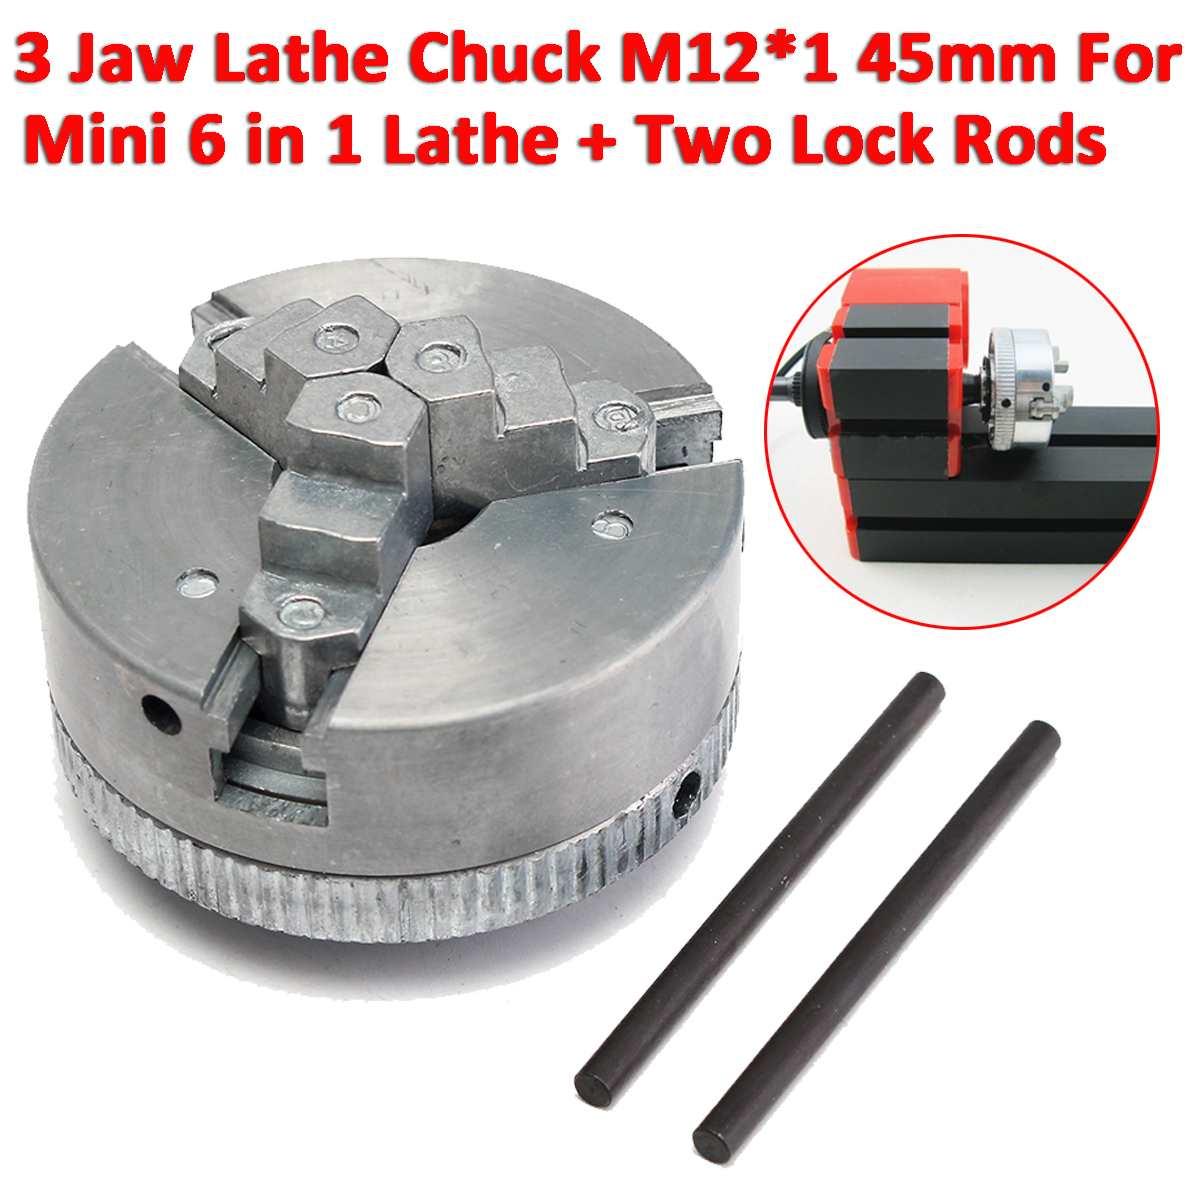 3 Jaw Self Centering Lathe Chuck Metal Scroll Chucks M12 1 45mm For